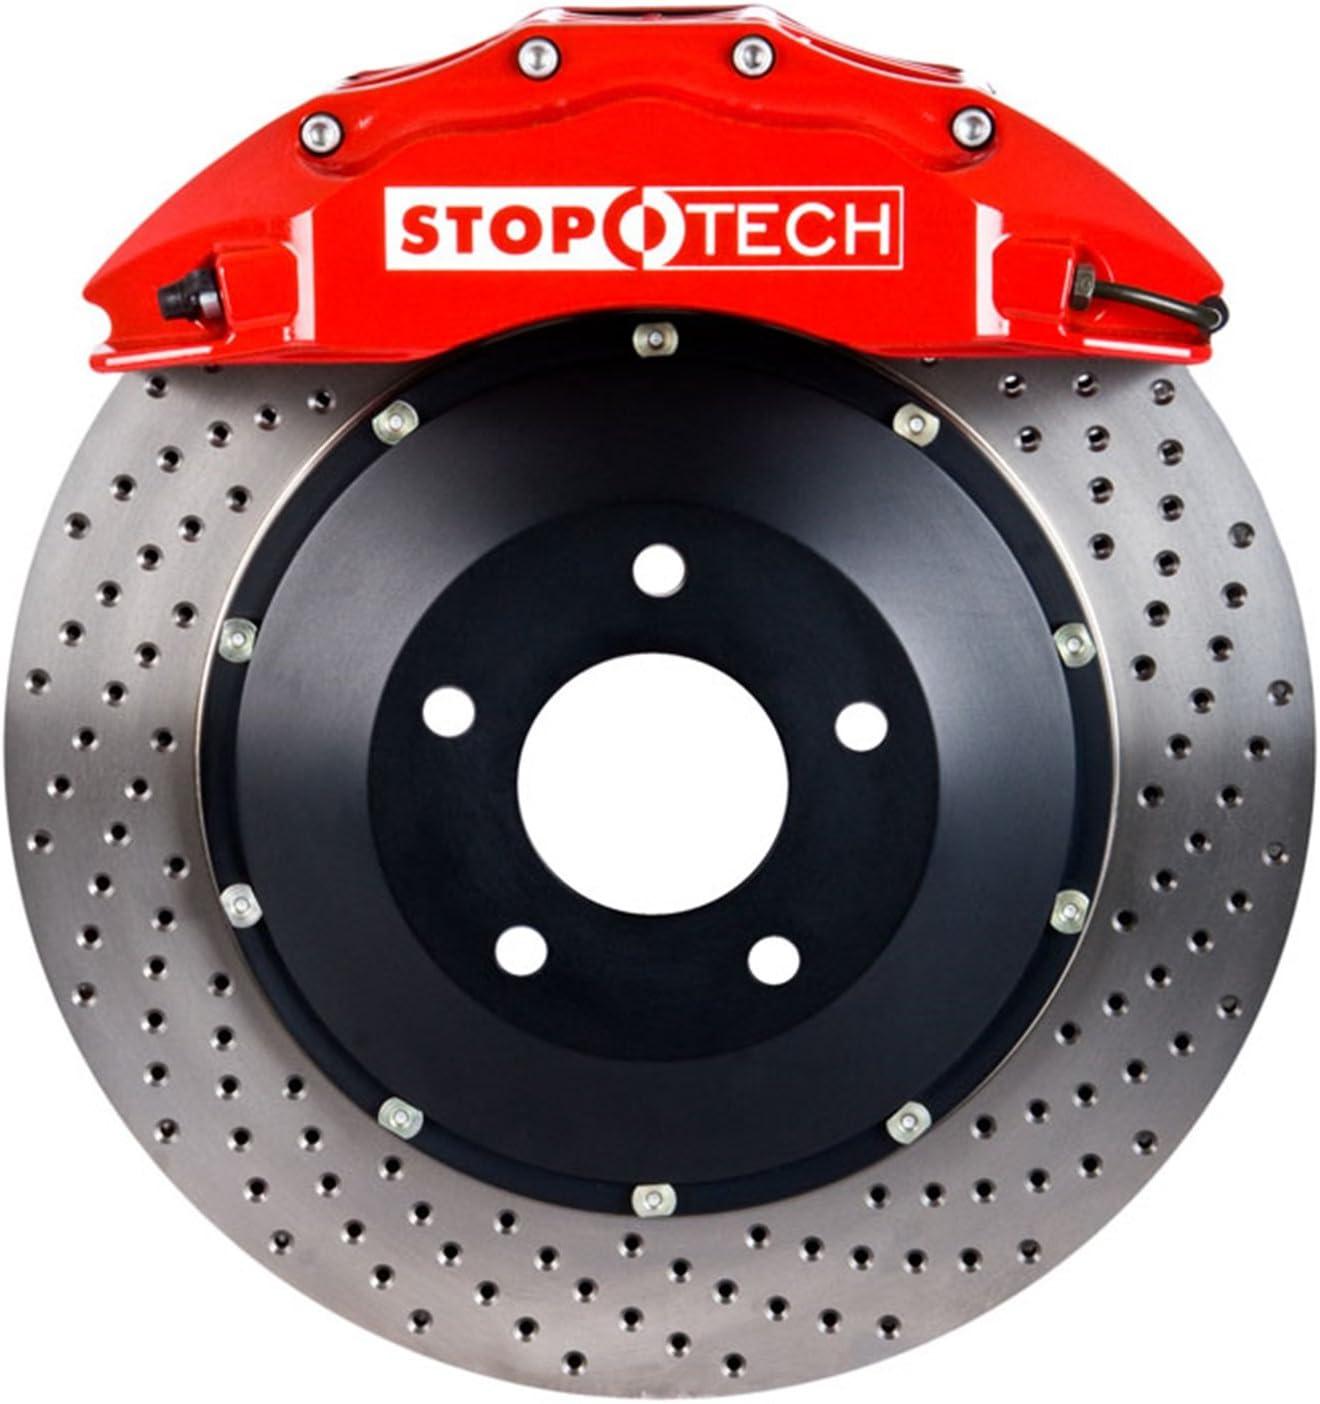 Free Miami Mall shipping on posting reviews StopTech 83.191.6800.72 Big Brake 1 Pack Kit